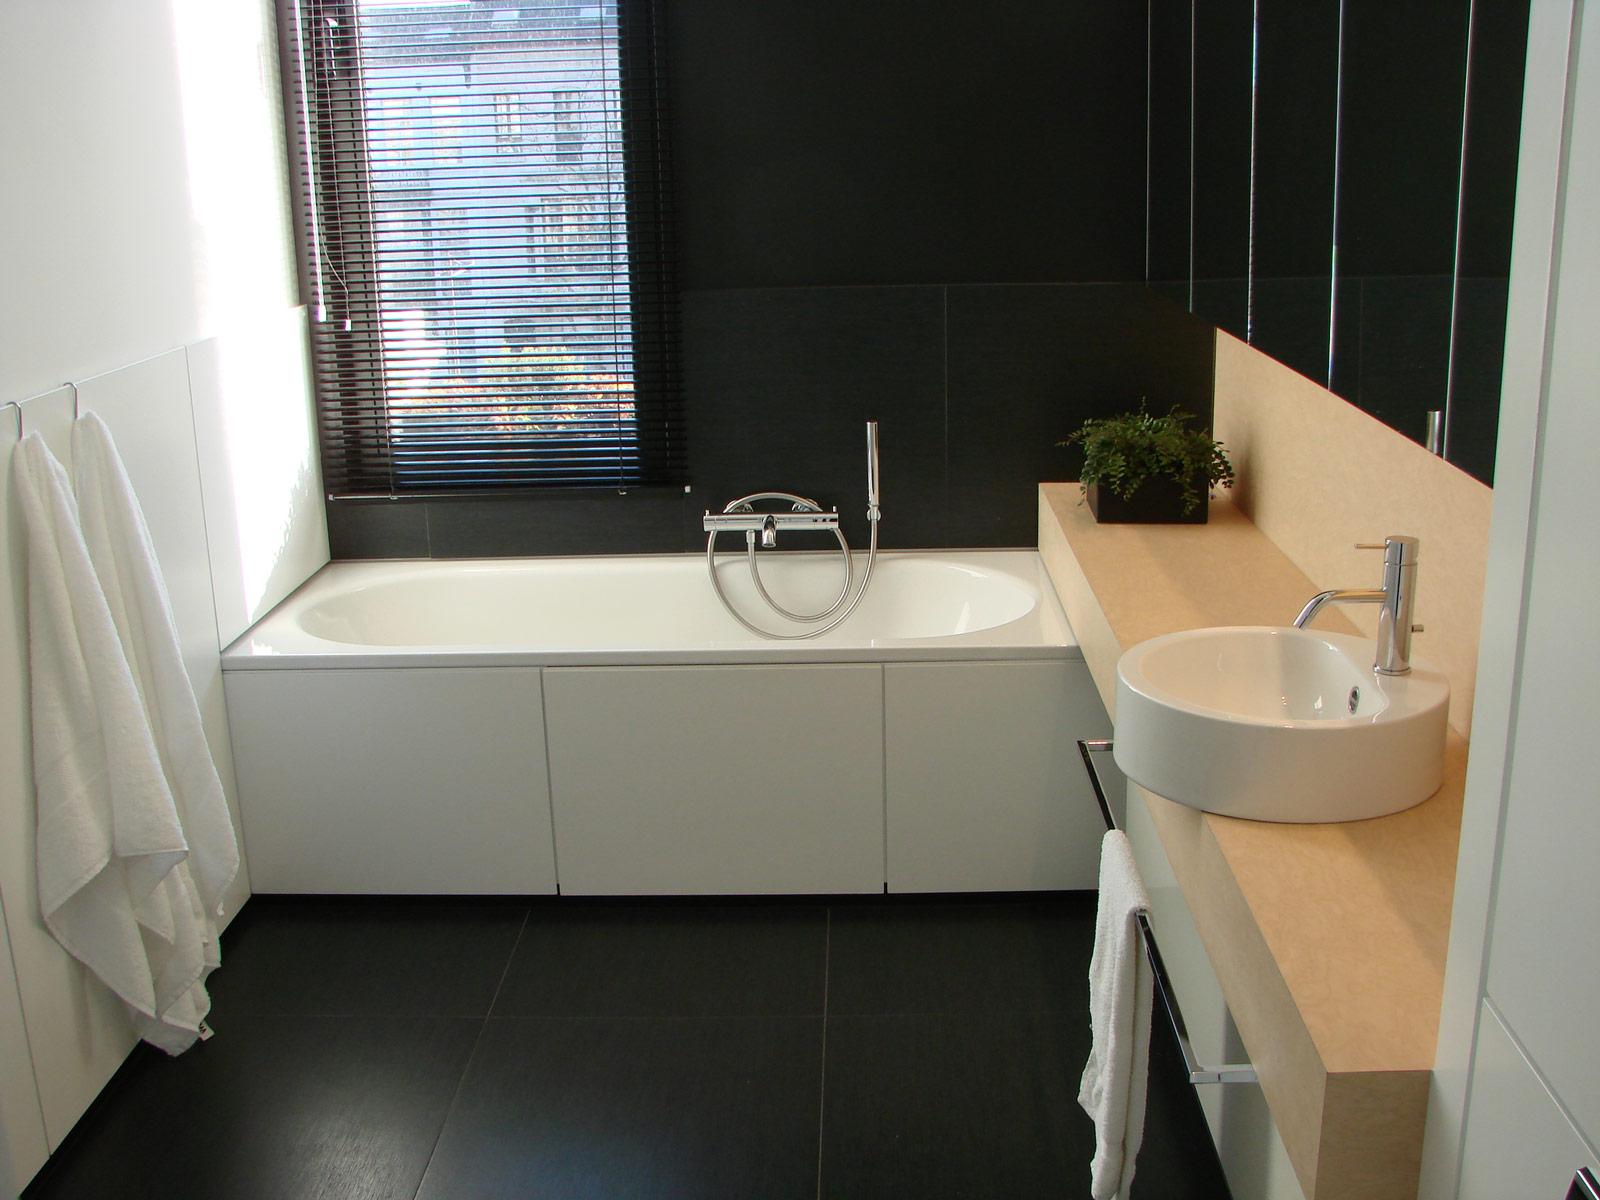 Renovatie badkamer for Planner badkamer